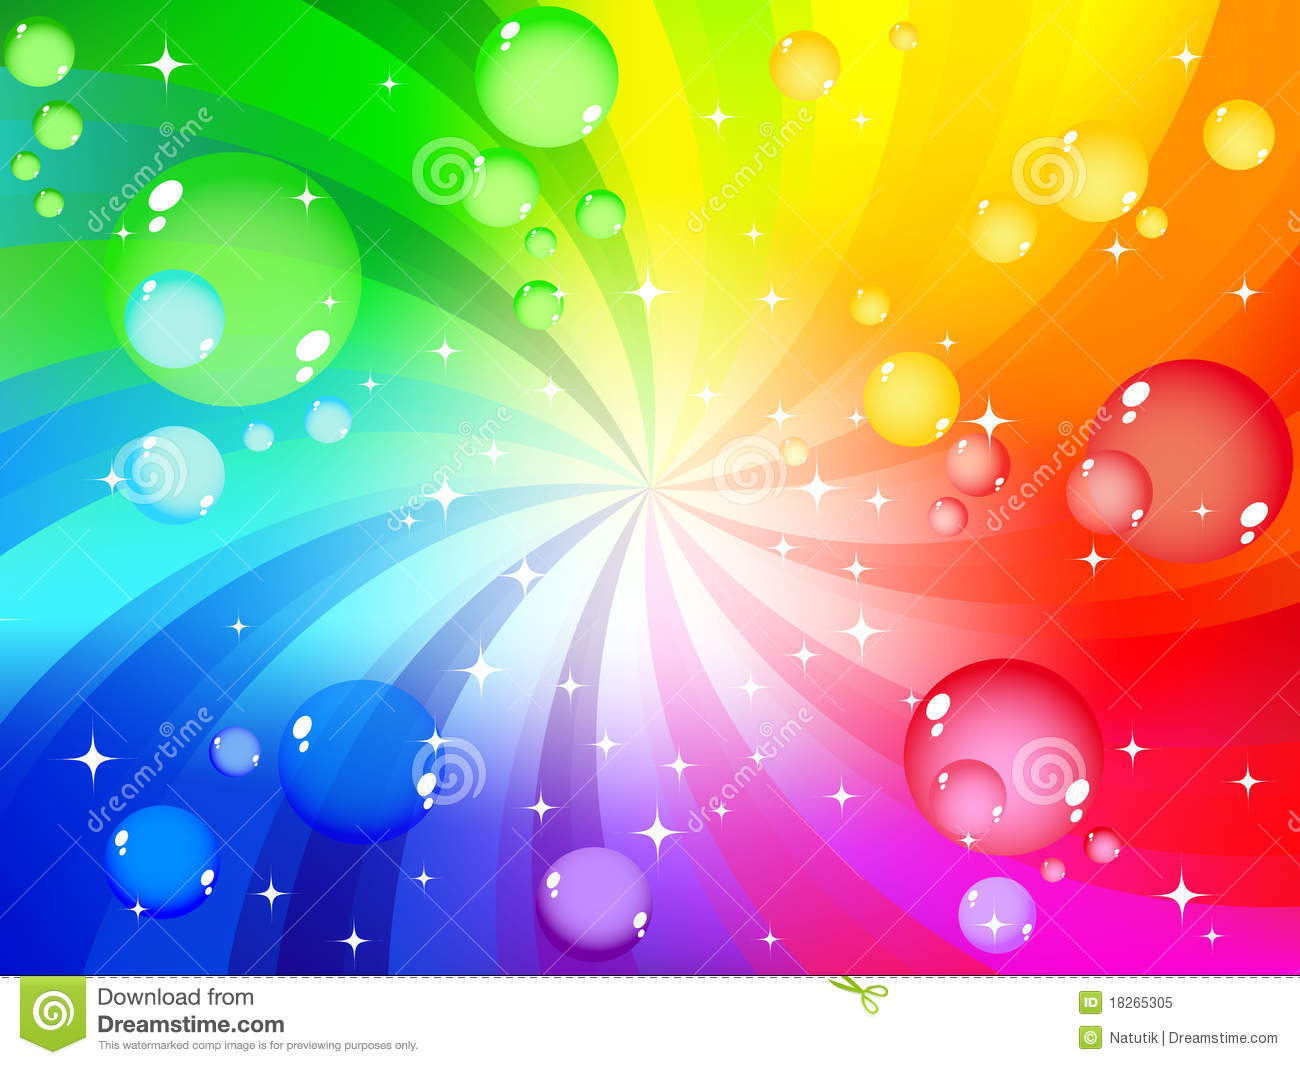 Colorful Bubble Backgrounds Colorful bubble background 1300x1065